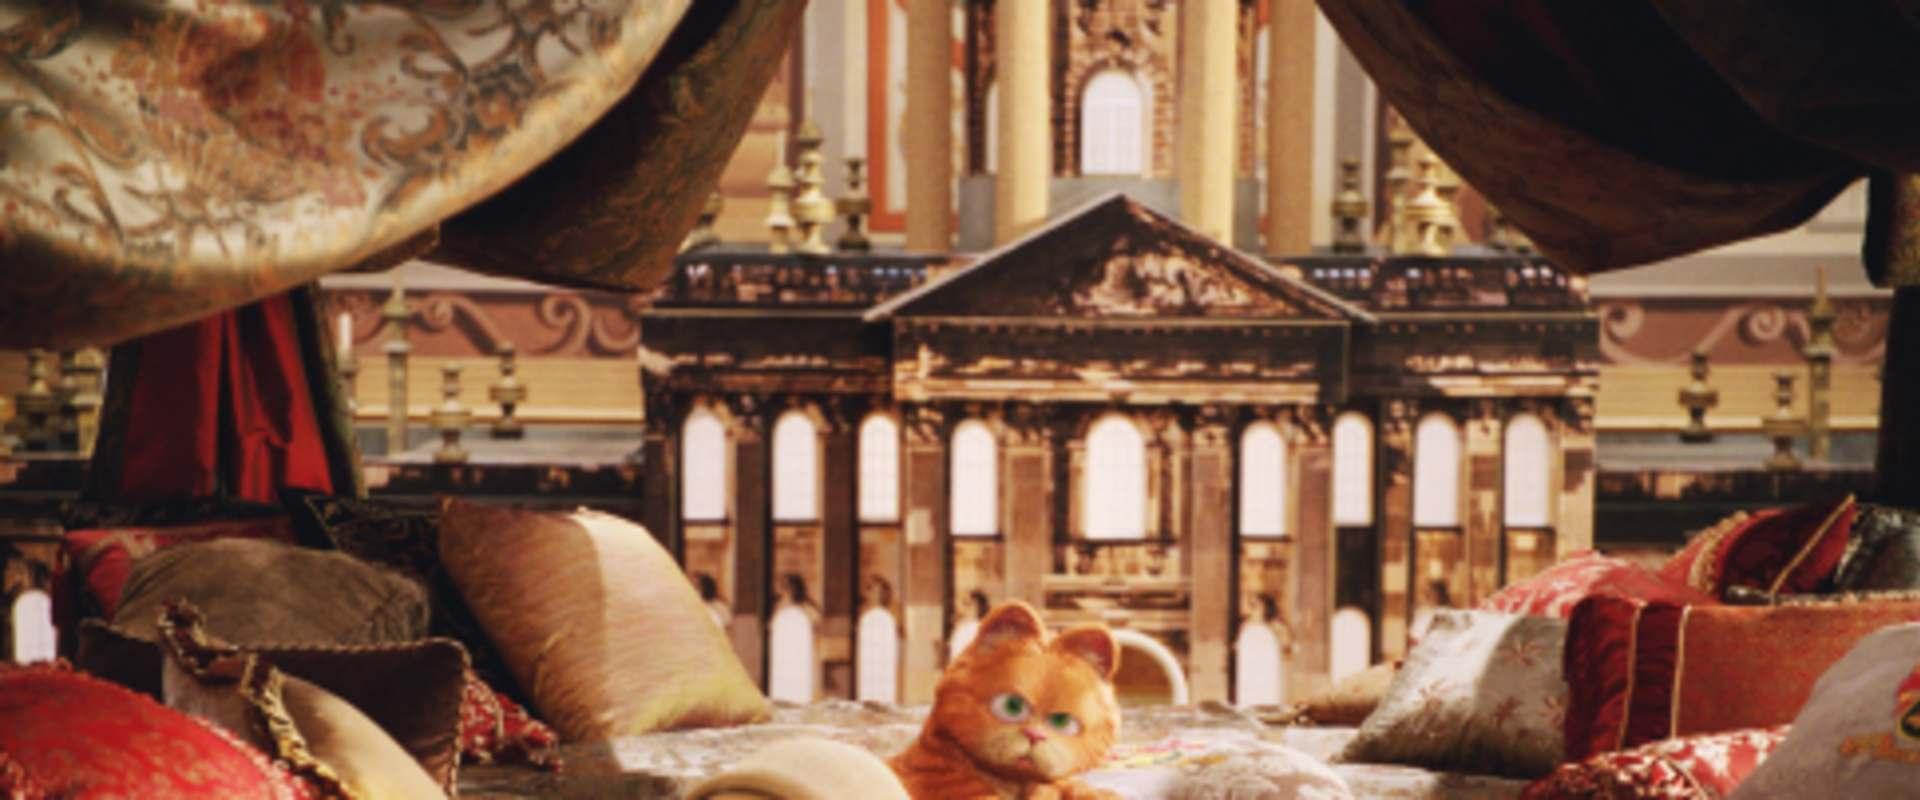 Watch Garfield 2 On Netflix Today Netflixmovies Com